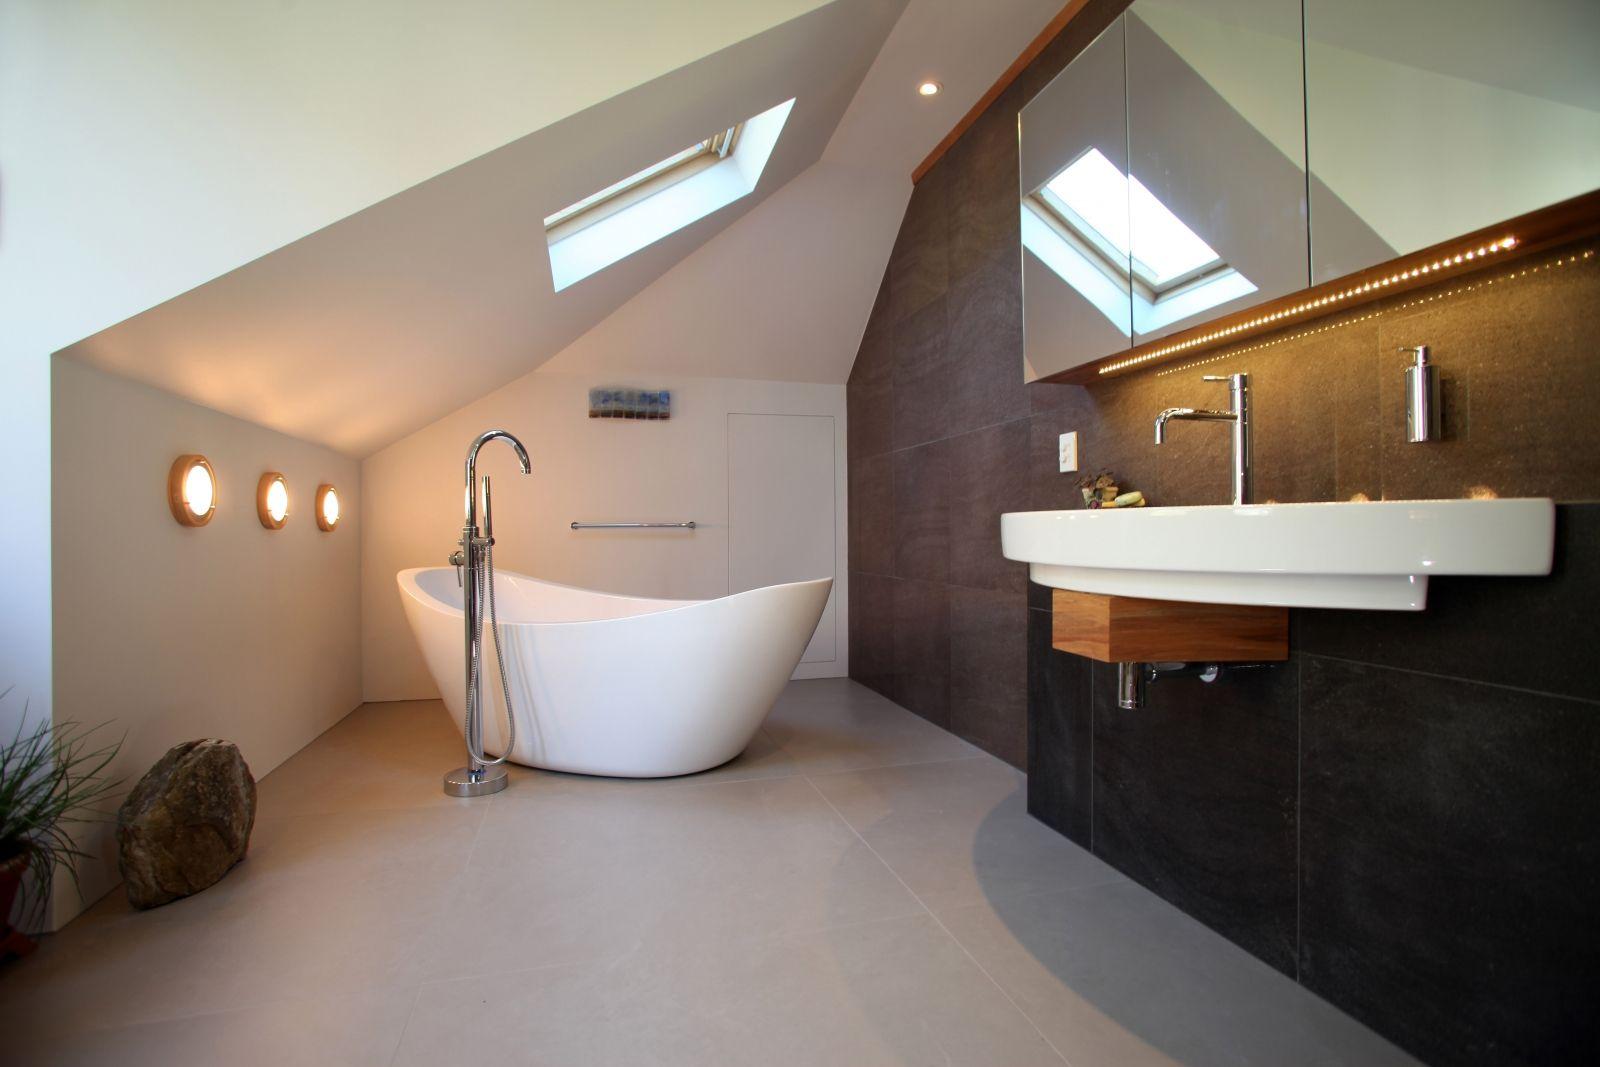 past bathroom interior design projects surfacedesign on bathroom renovation ideas nz id=51626